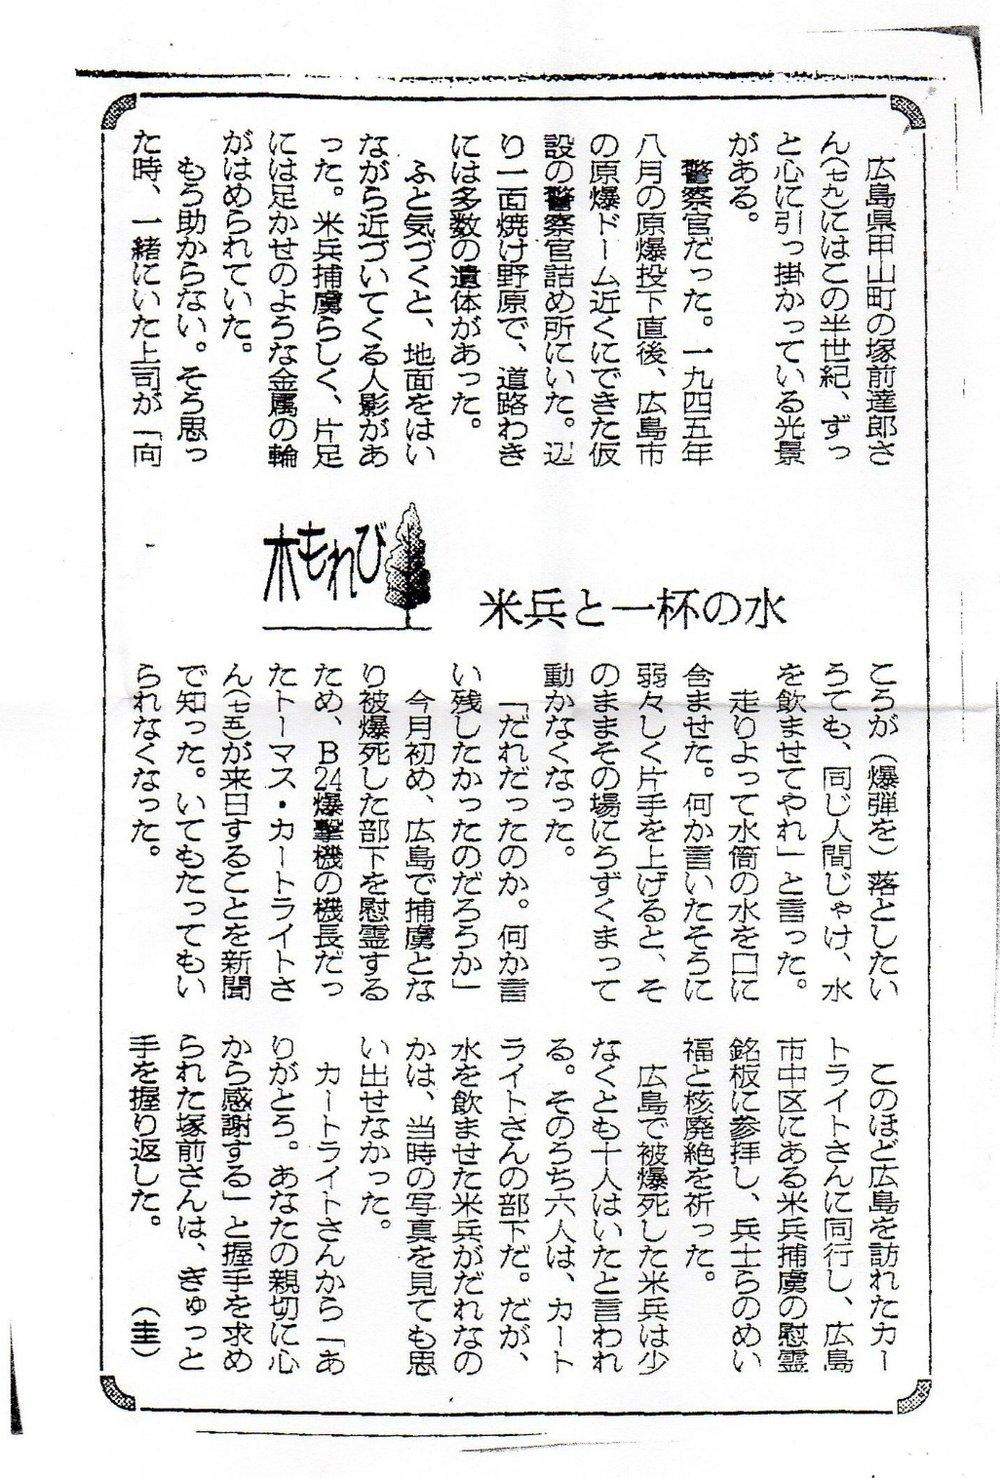 Asahi Shumbum, Osaka Edition, newspaper story, 24 October 1999